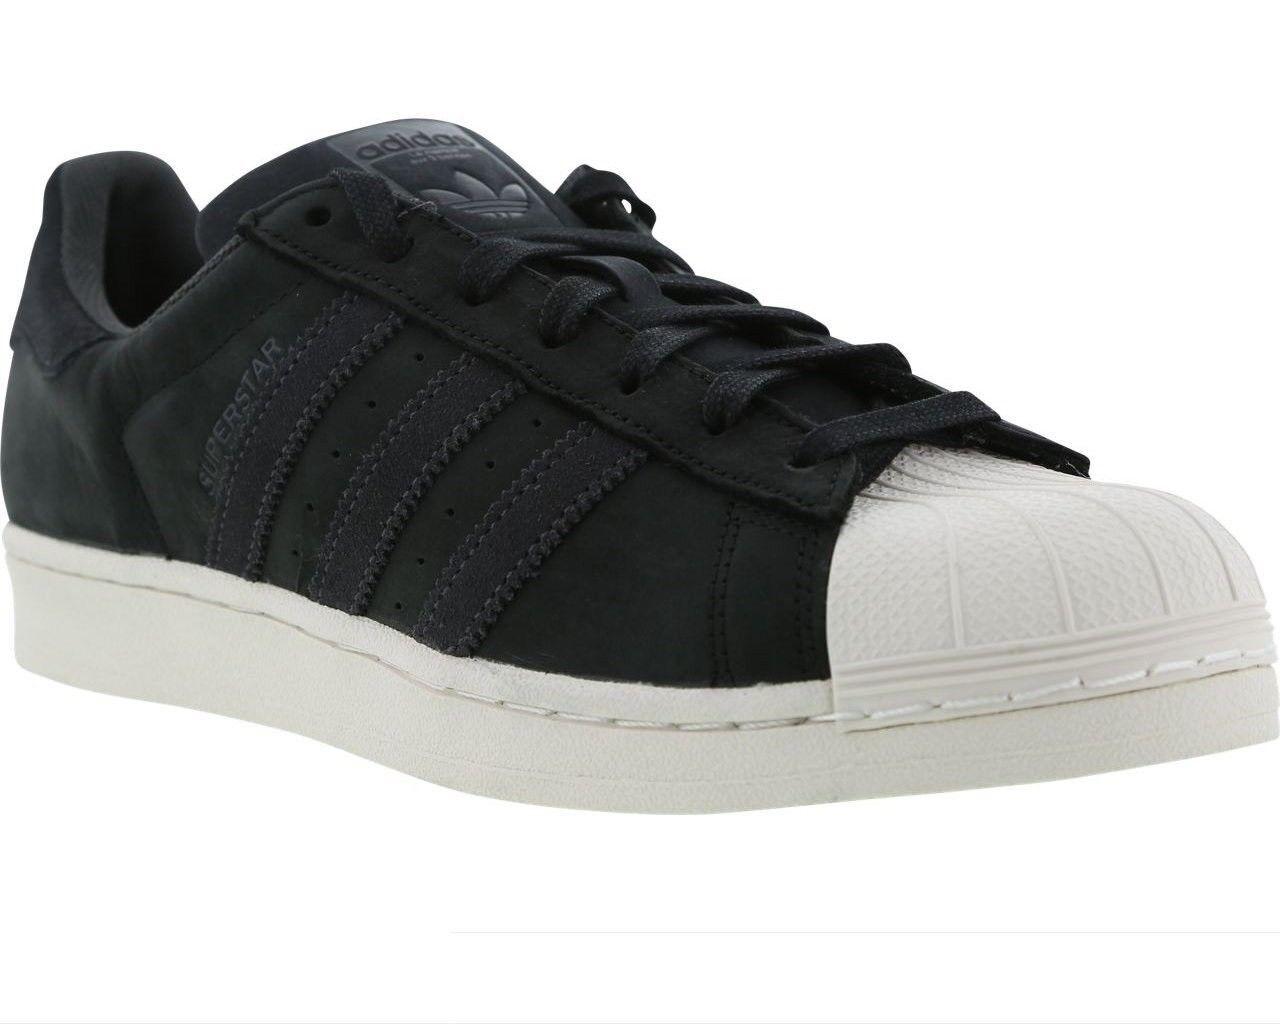 Da Uomo Adidas Originals Superstar CM8092 Scarpe Nero Bianco Pelle Scarpe Da Ginnastica